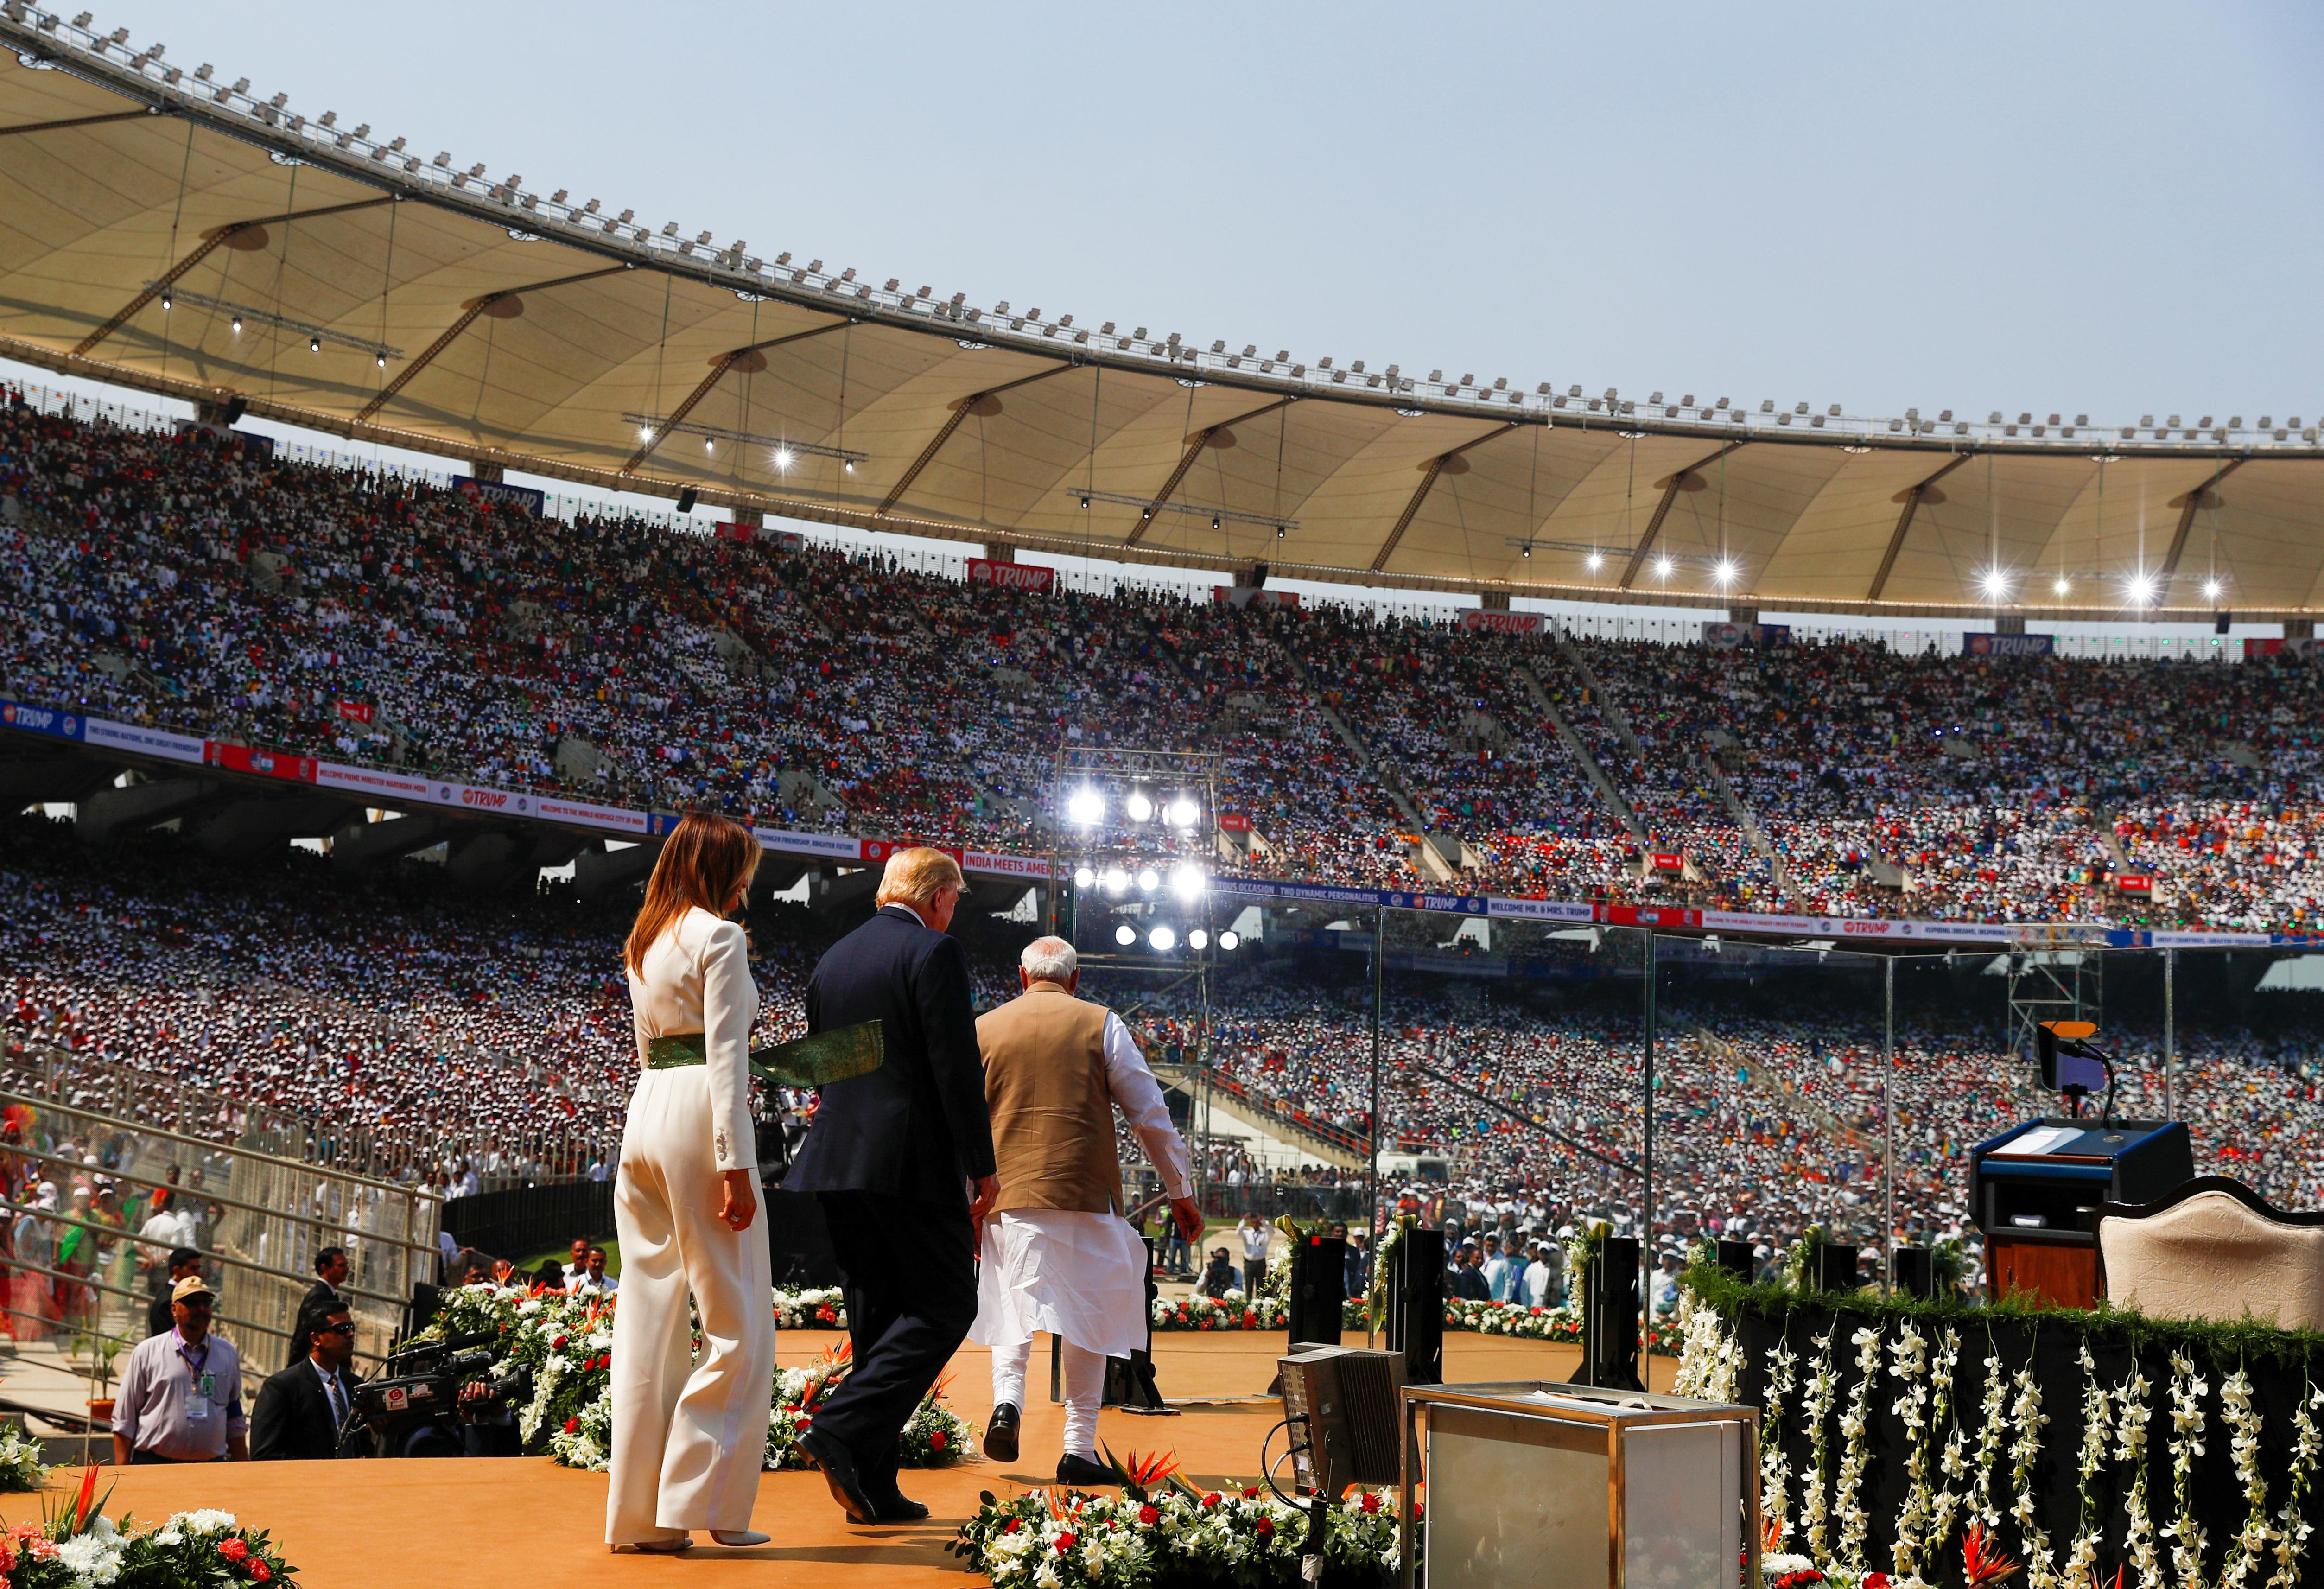 "U.S. President Donald Trump, first lady Melania Trump and Indian Prime Minister Narendra Modi attend a ""Namaste Trump"" event during Trump's visit to India, at Sardar Patel Gujarat Stadium, in Ahmedabad, India, February 24, 2020. (REUTERS/Al Drago)"